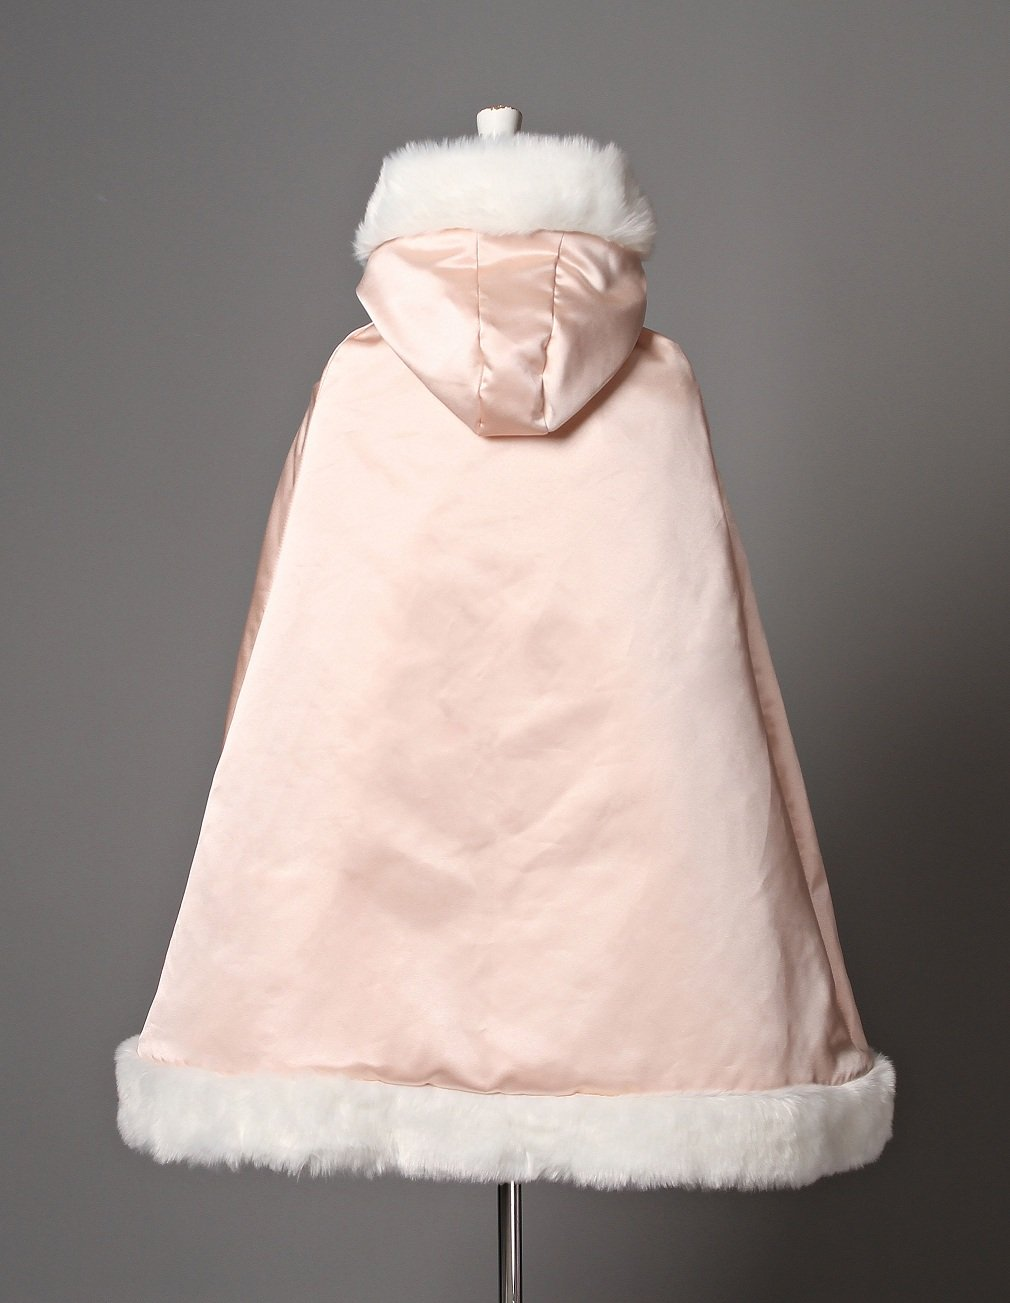 BEAUTELICATE Flower Girl Cape Winter Wedding Cloak for Infant Junior Bridesmaid Hooded Reversible Ivory 44 by BEAUTELICATE (Image #6)